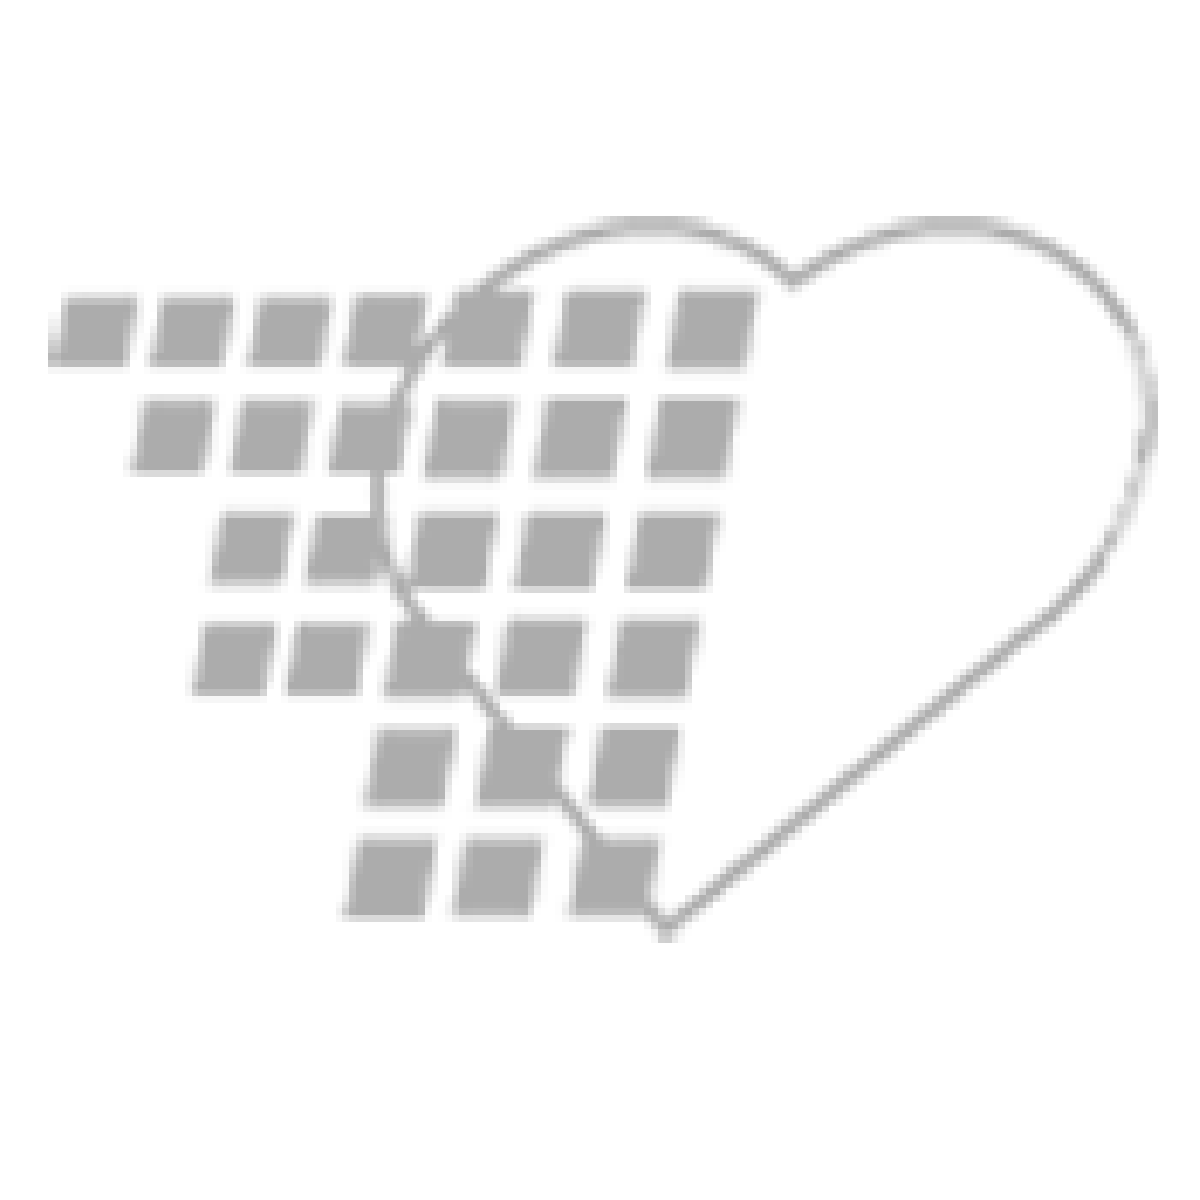 05-93-0503 Pocket Nurse® Simulated Jevty